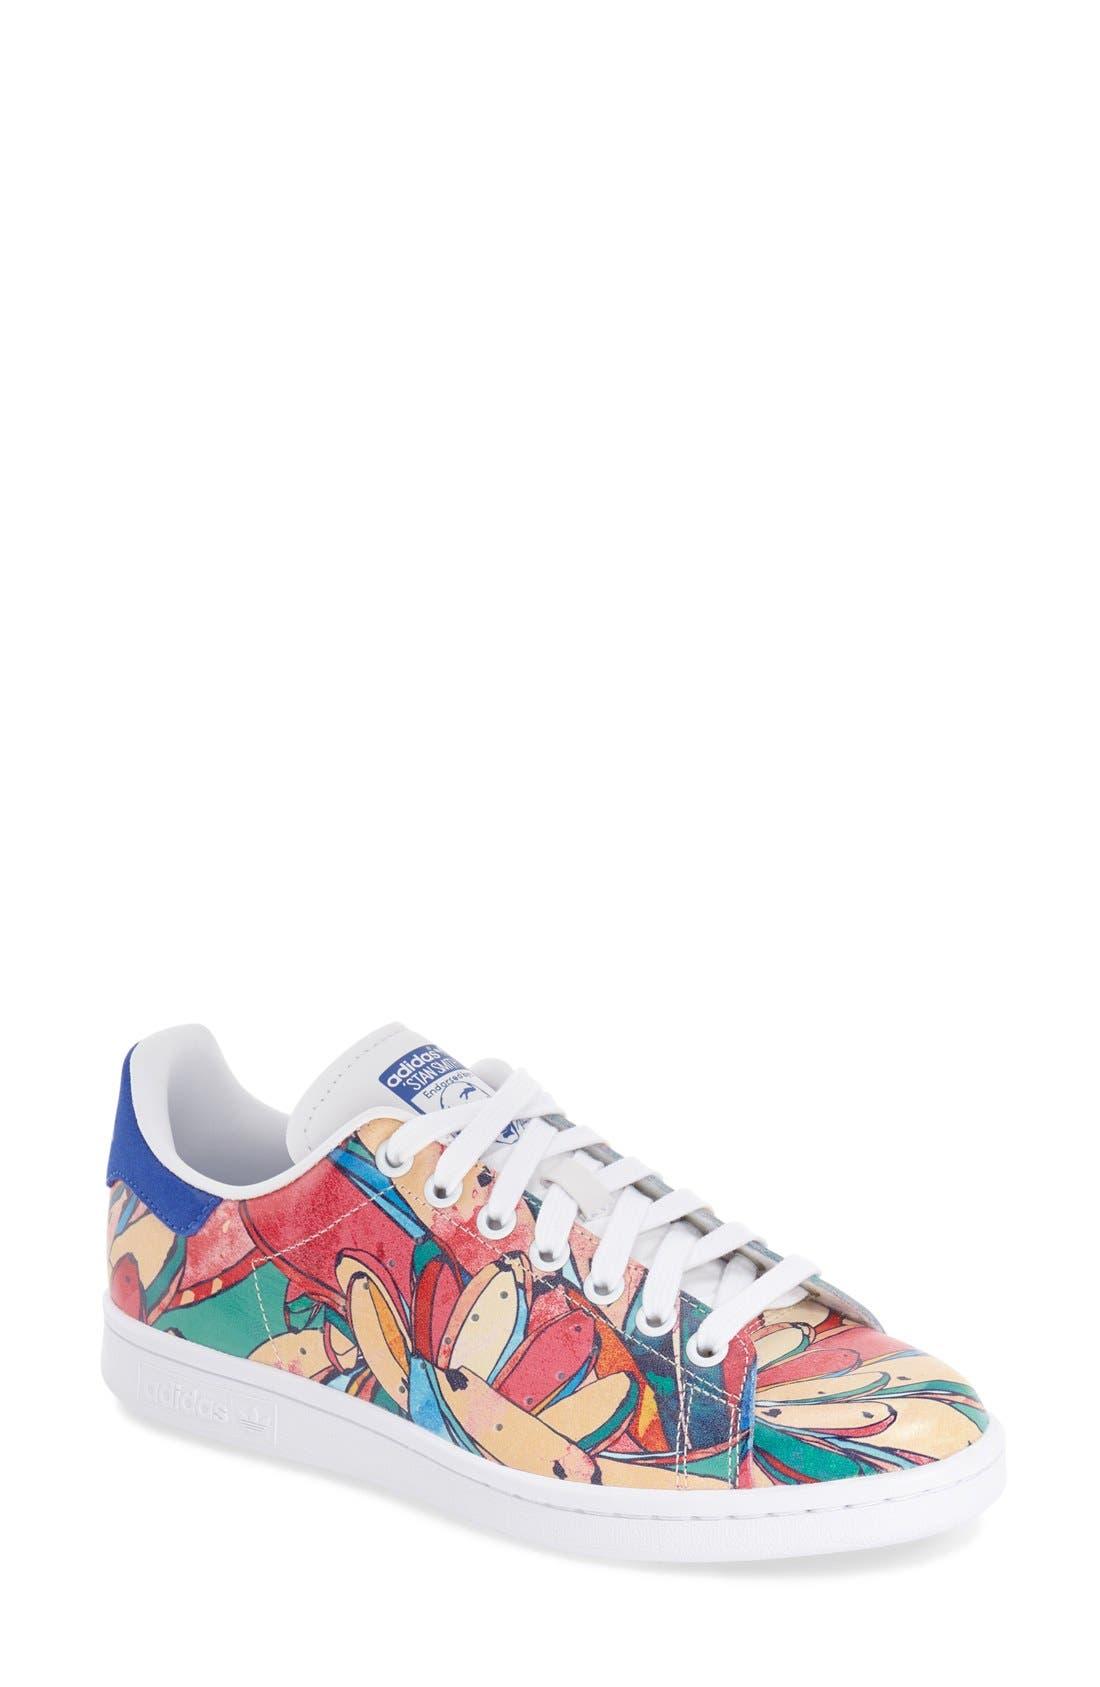 Main Image - adidas x The FARM Company 'Stan Smith' Sneaker (Women)